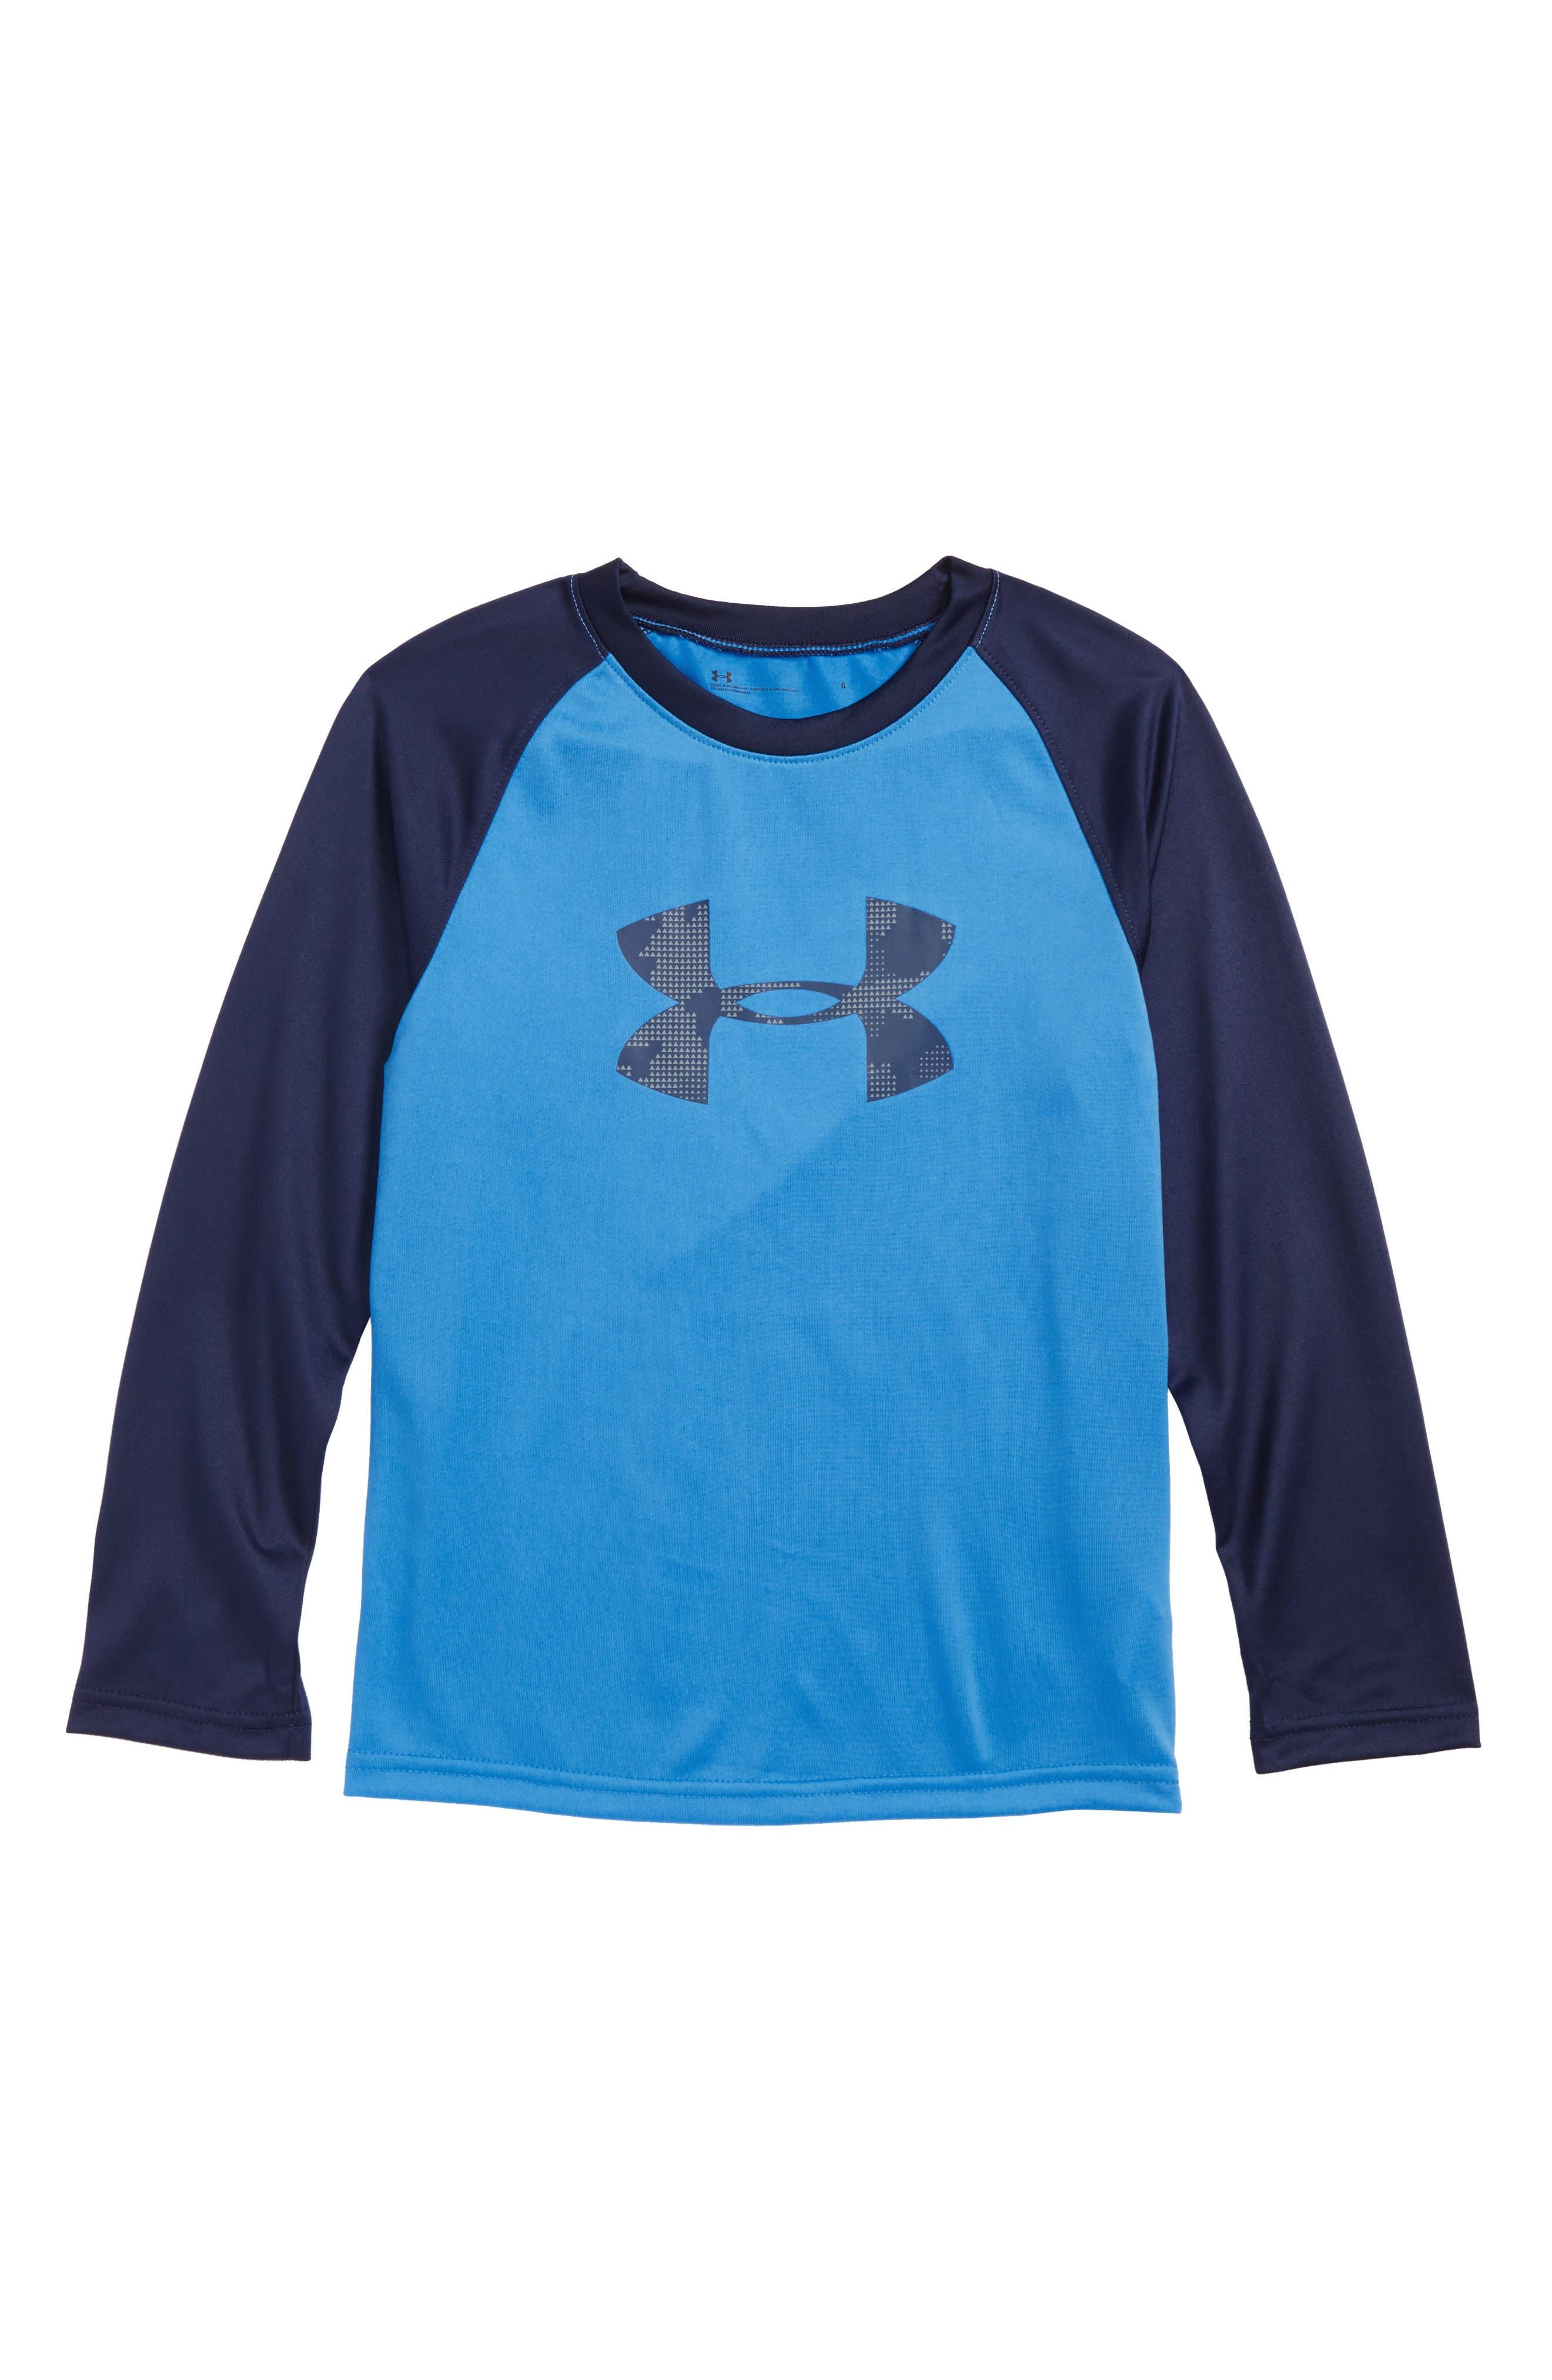 Under Armour Camo Big Logo HeatGear® T-Shirt (Toddler Boys & Little Boys)